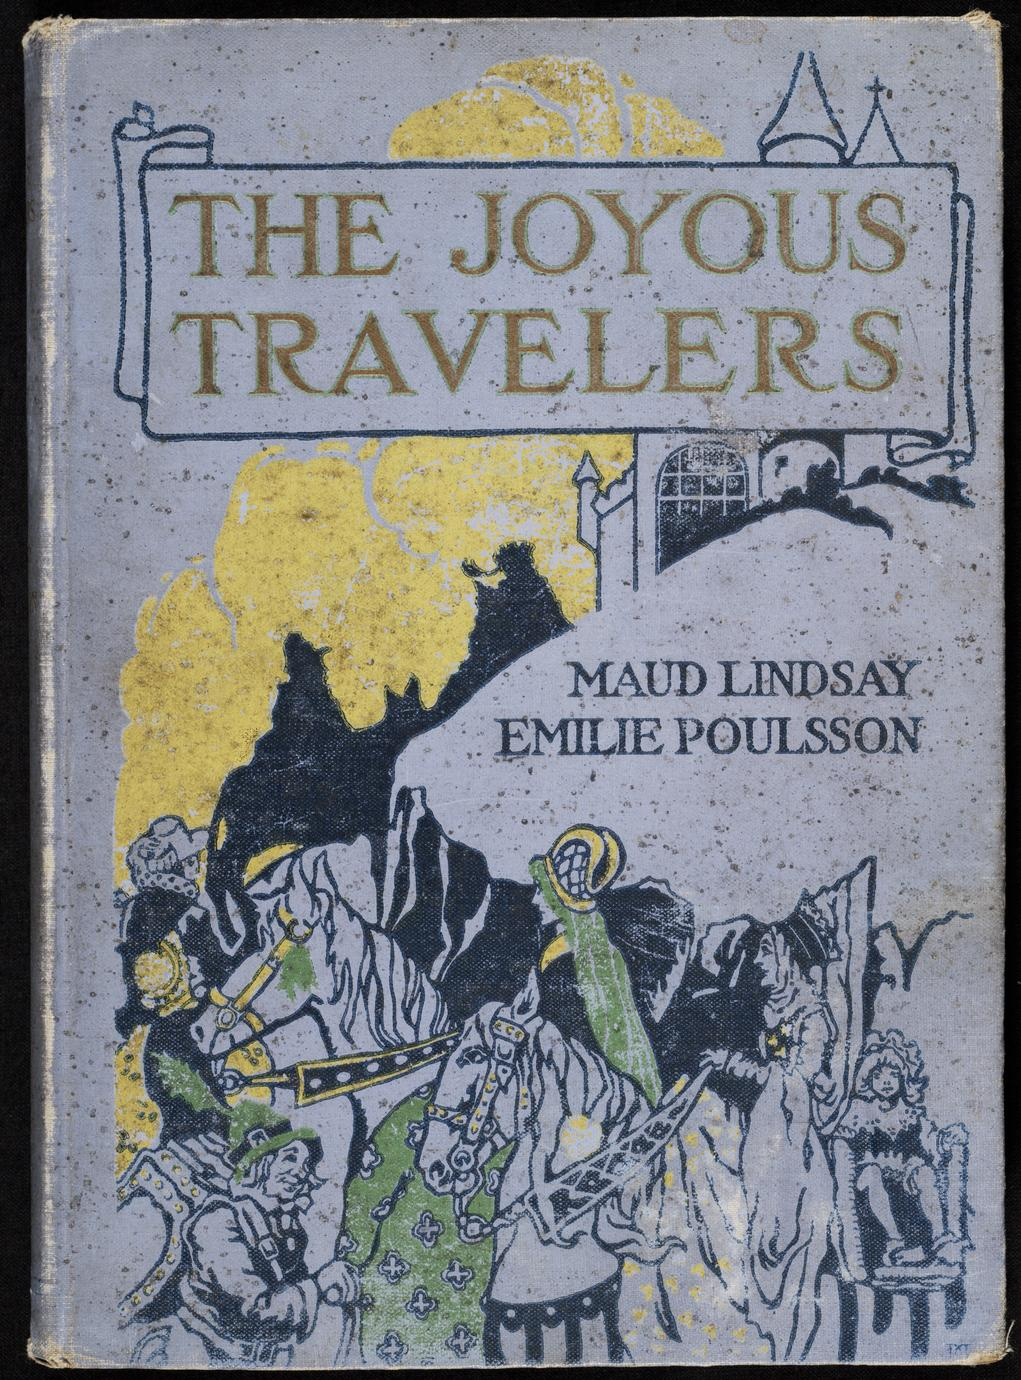 The joyous travelers (1 of 3)